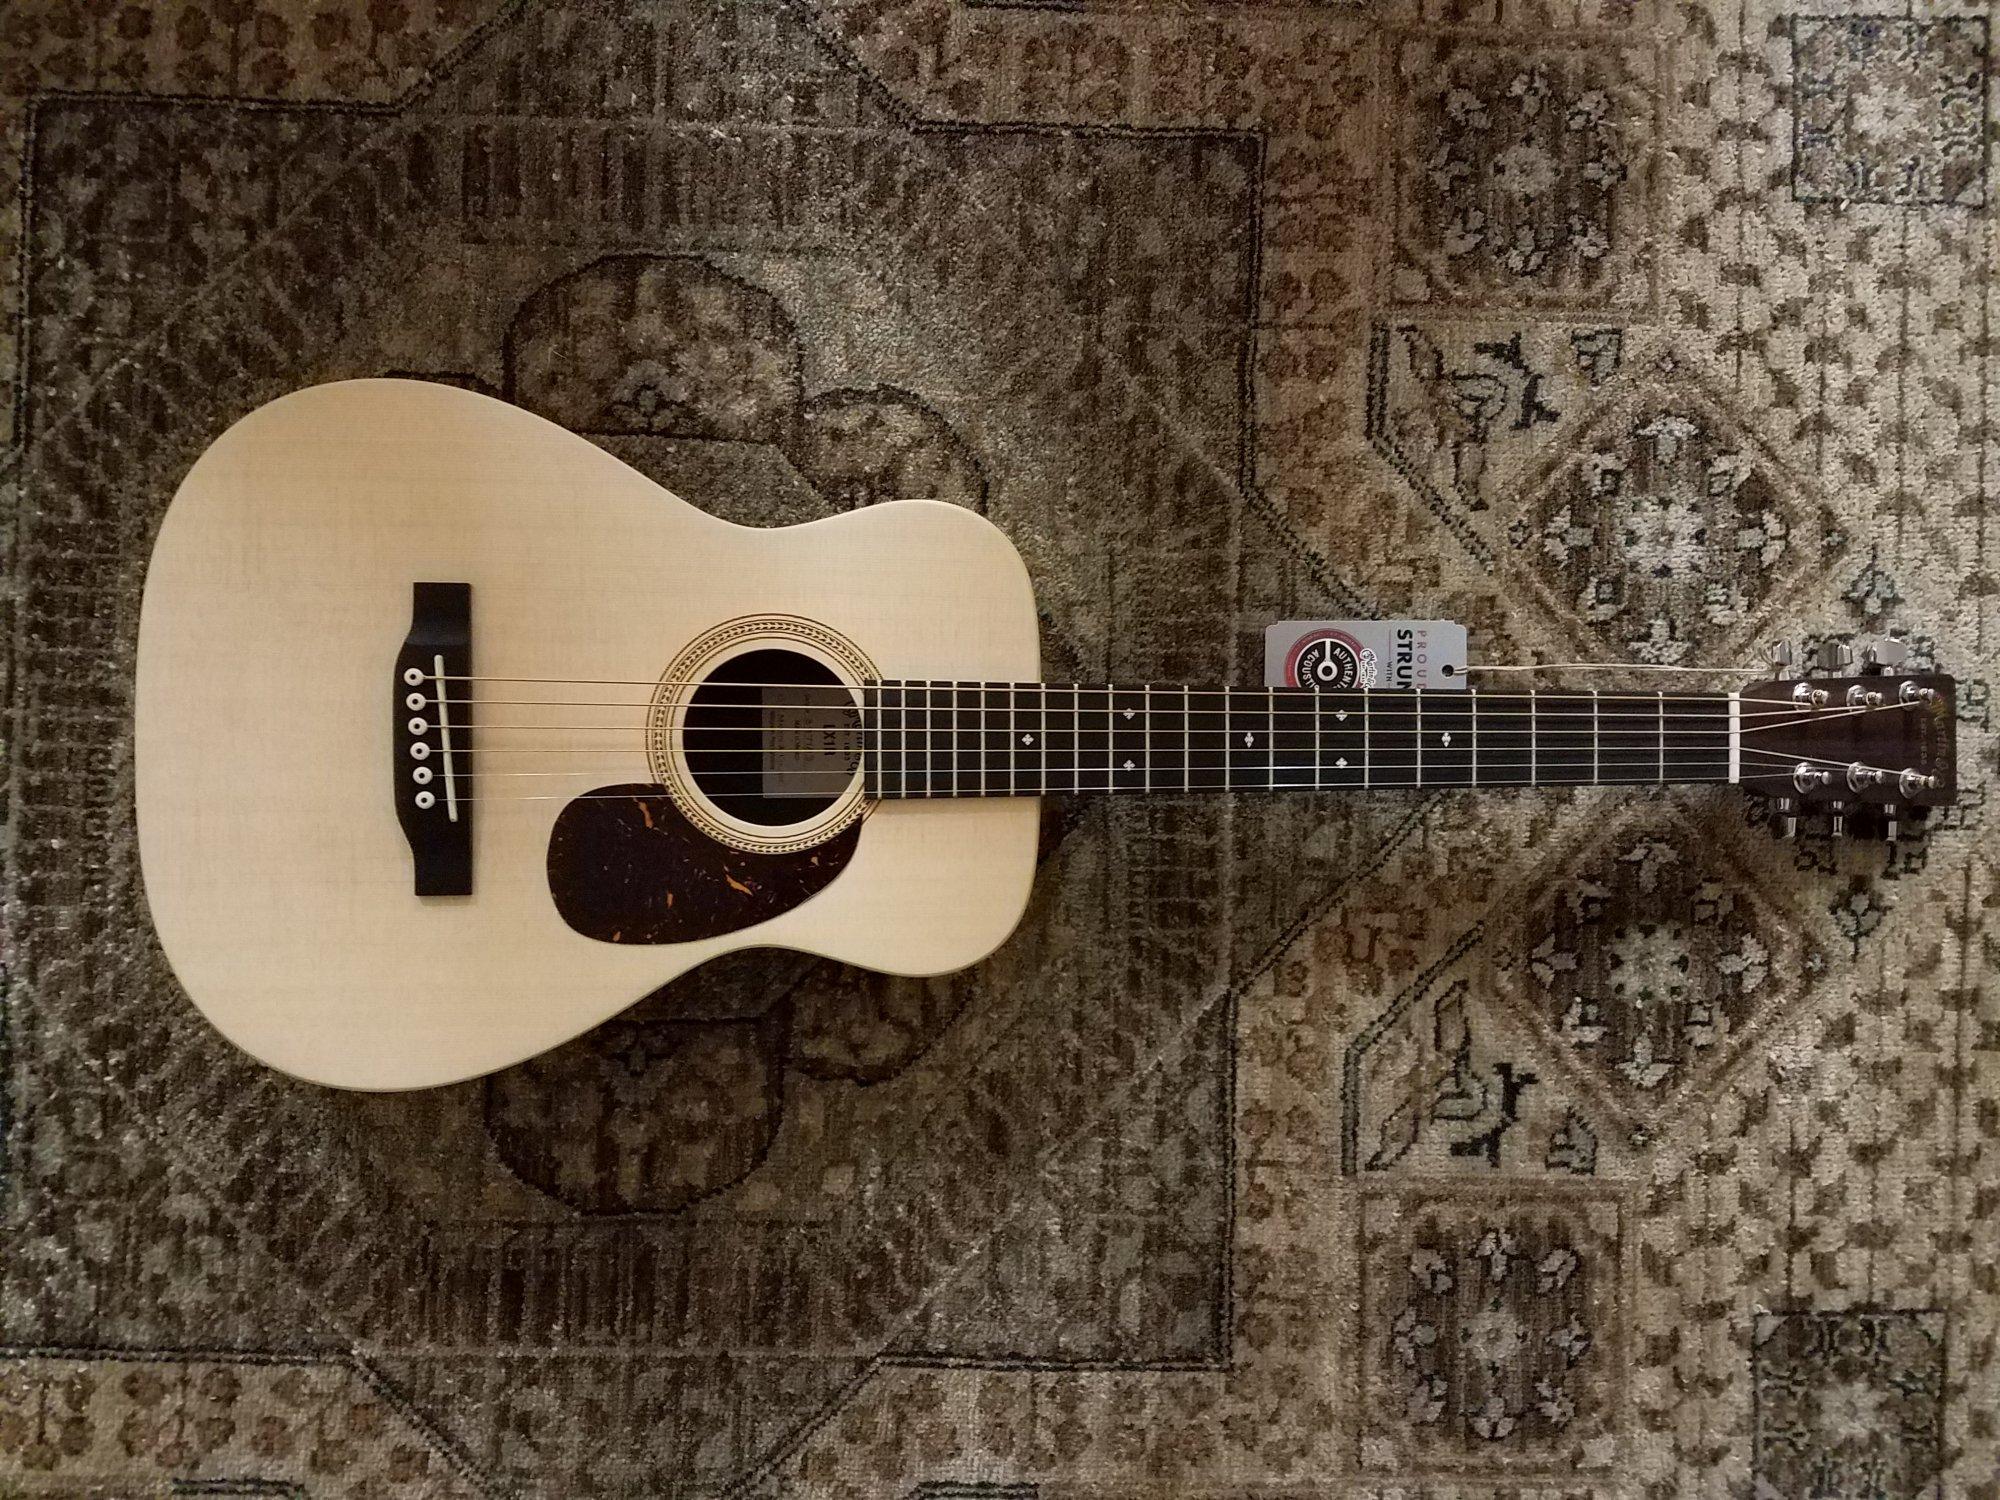 Martin LX1R Little Martin Acoustic w/ Gig Bag & Free Pro Setup